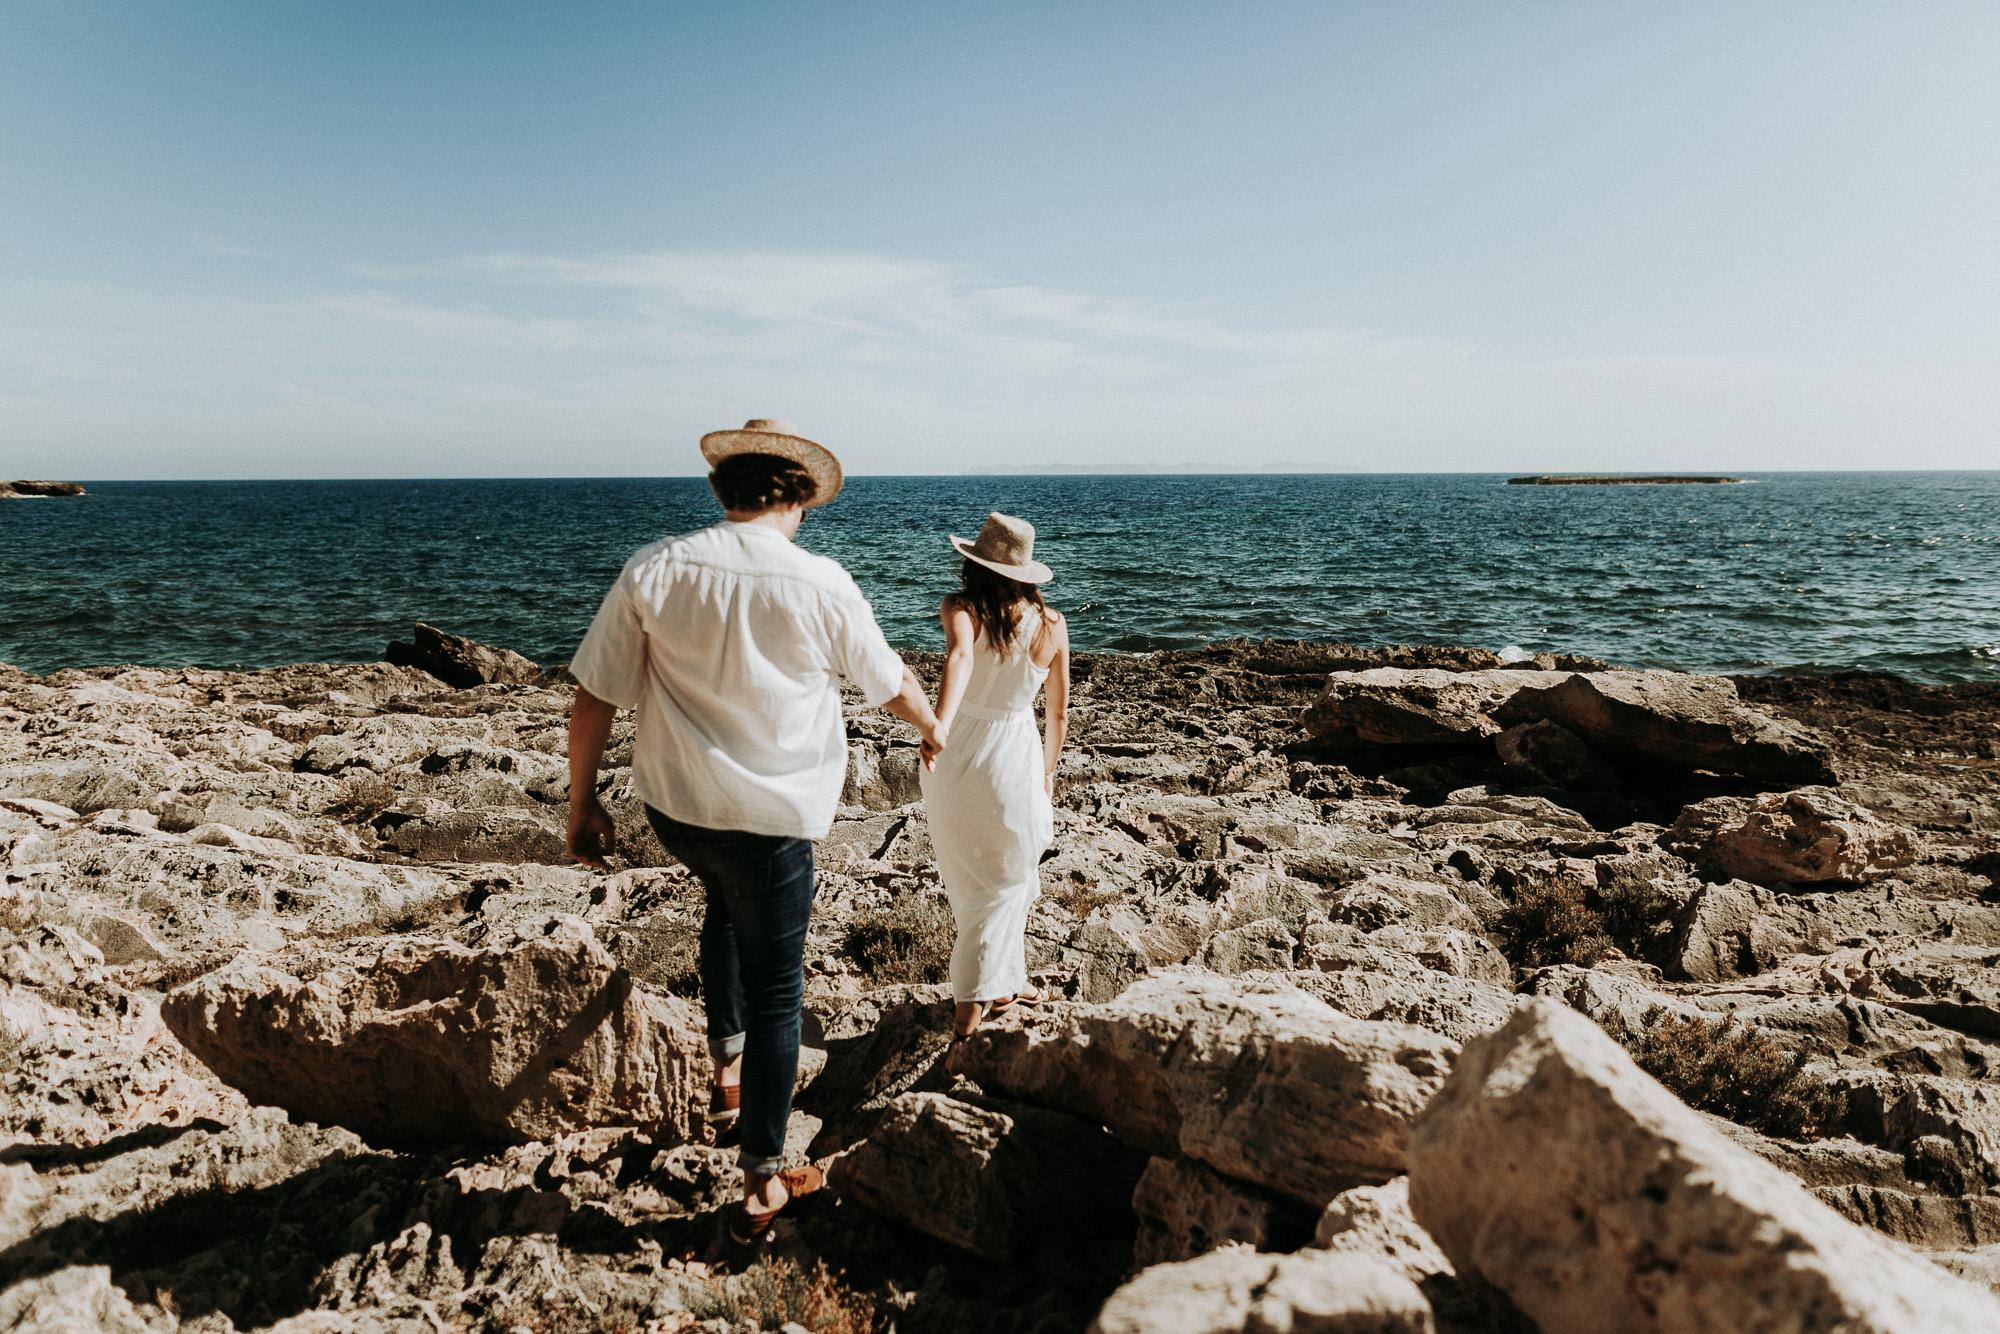 DanielaMarquardtPhotography_wedding_elopement_mallorca_spain_stjordi_sessalines_marinaandxavi343